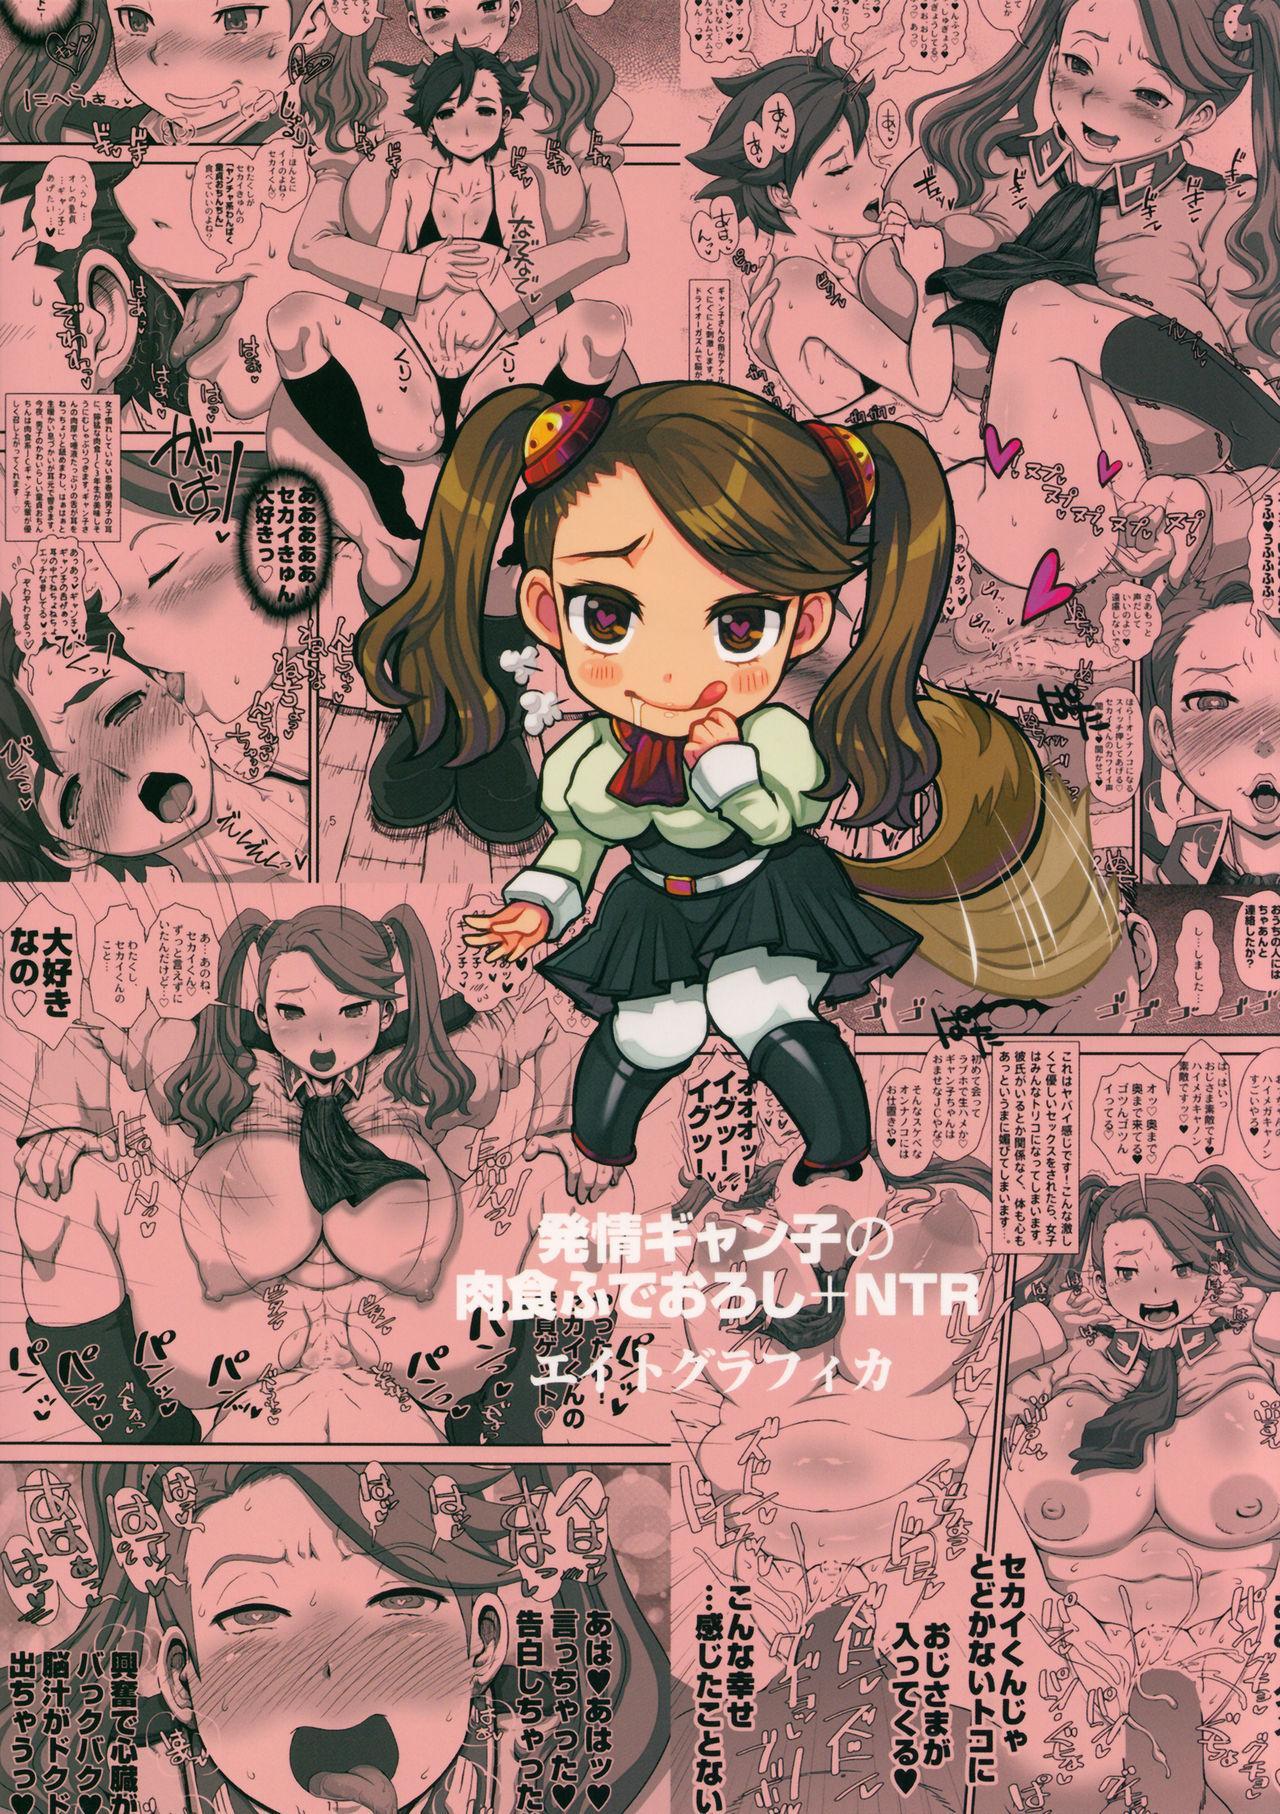 METABOLISM G Hatsujou Gyanko no Nikushoku Fudeoroshi + NTR | 肥滿主義G 發情強子的肉食開苞+NTR 26